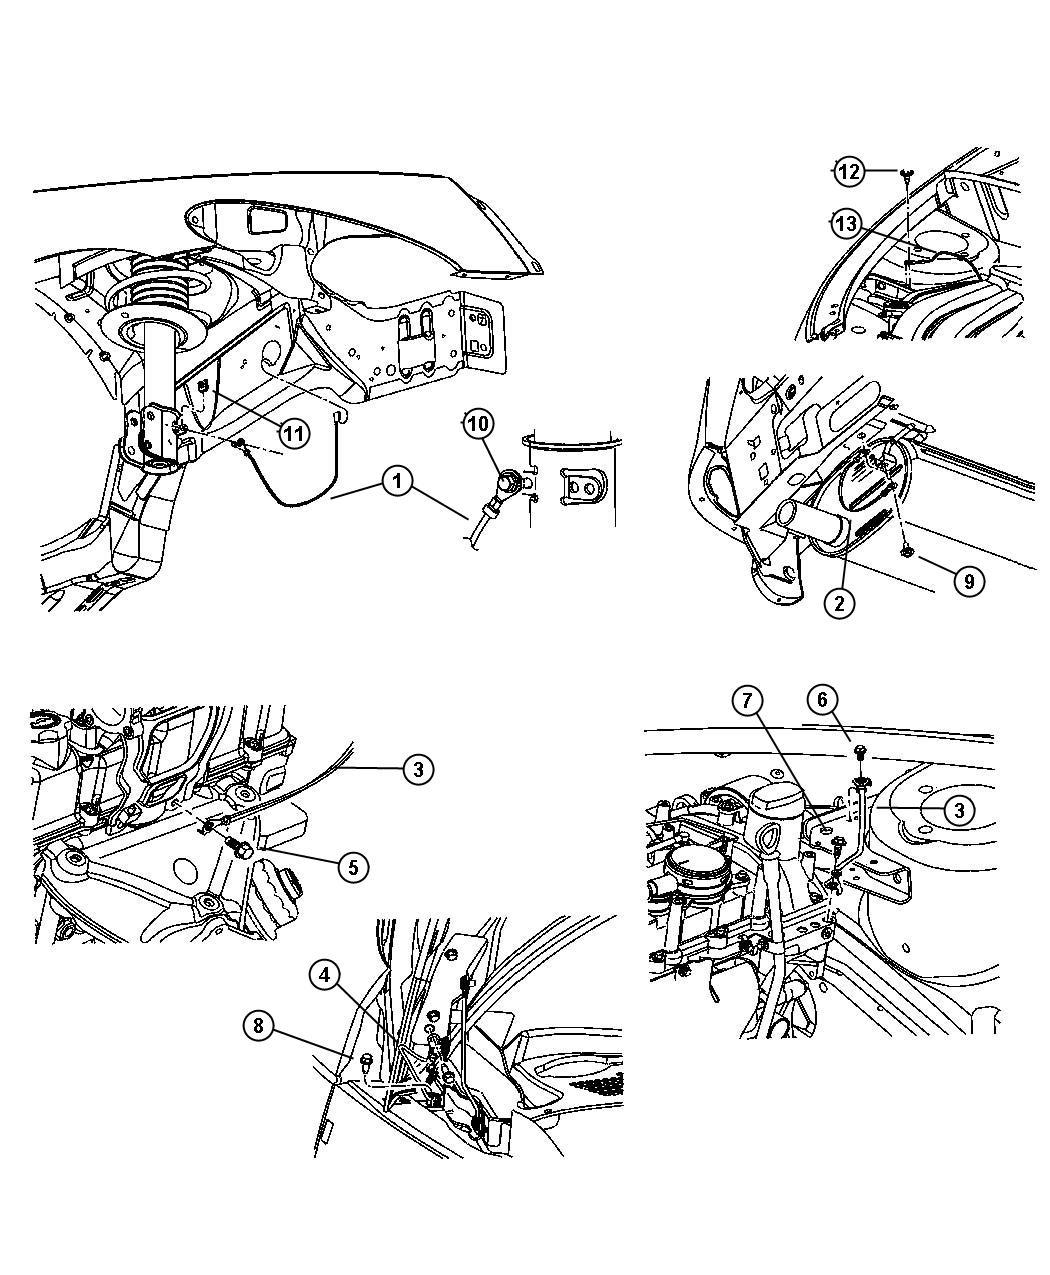 Chrysler PT Cruiser Strap. Ground. Engine to body